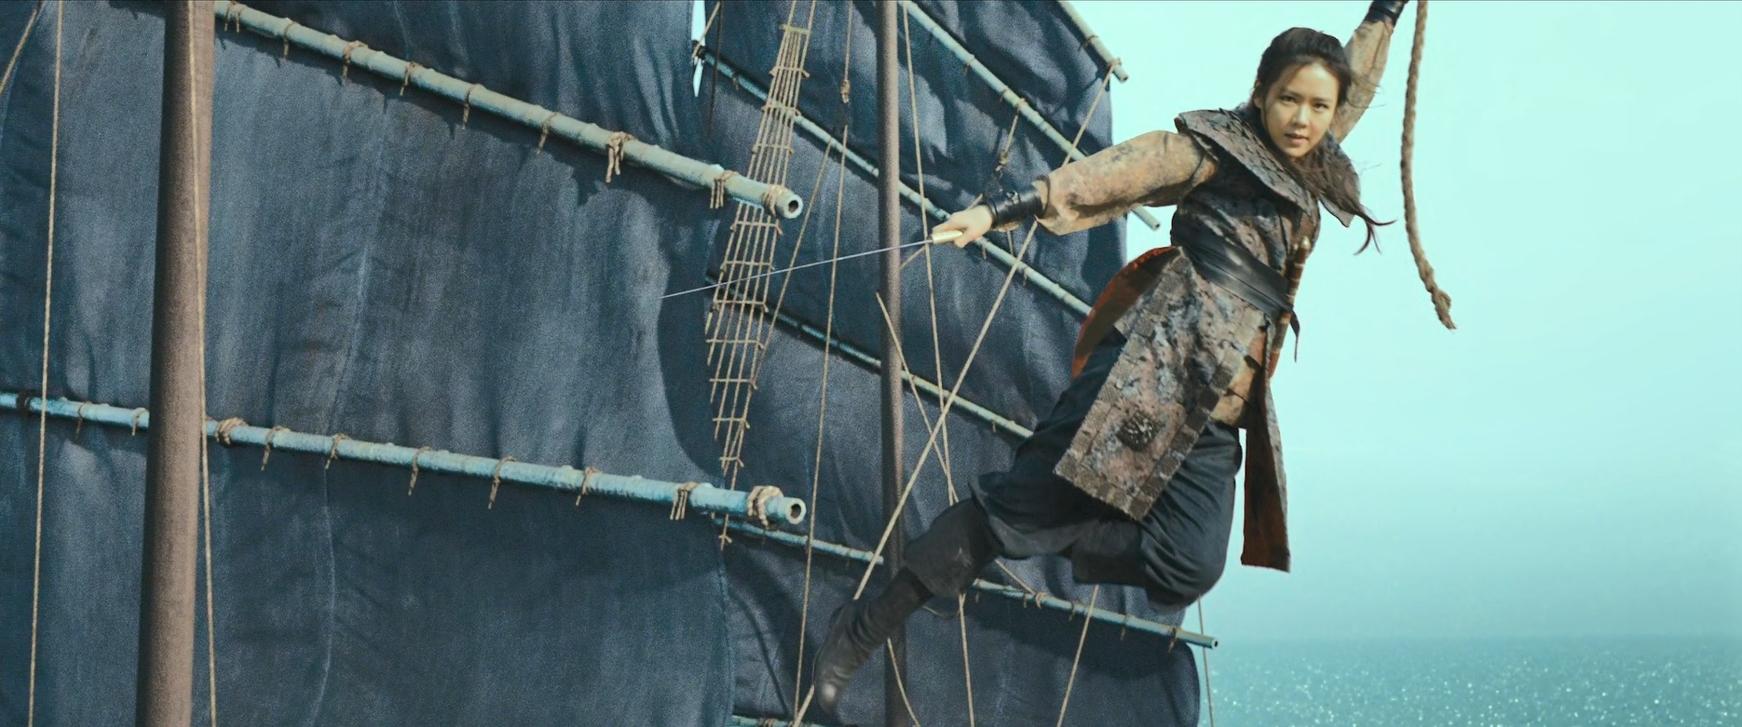 The Pirates Aloft 01